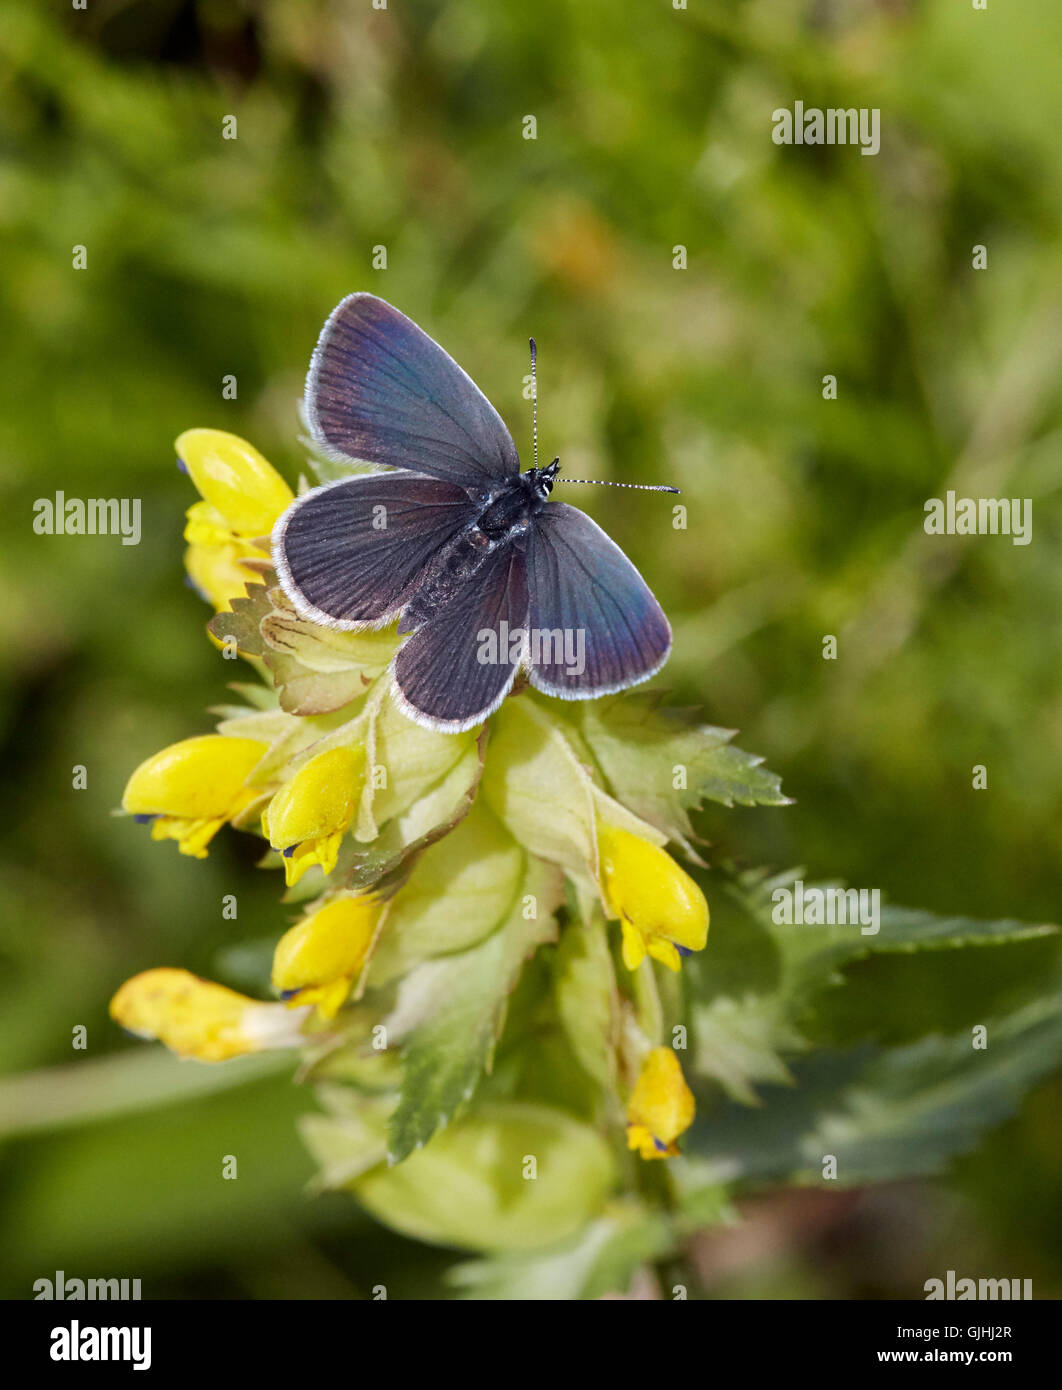 Piccole farfalle blu su giallo-rattle fiori. Warren Farm, Ewell, Surrey, Inghilterra. Immagini Stock